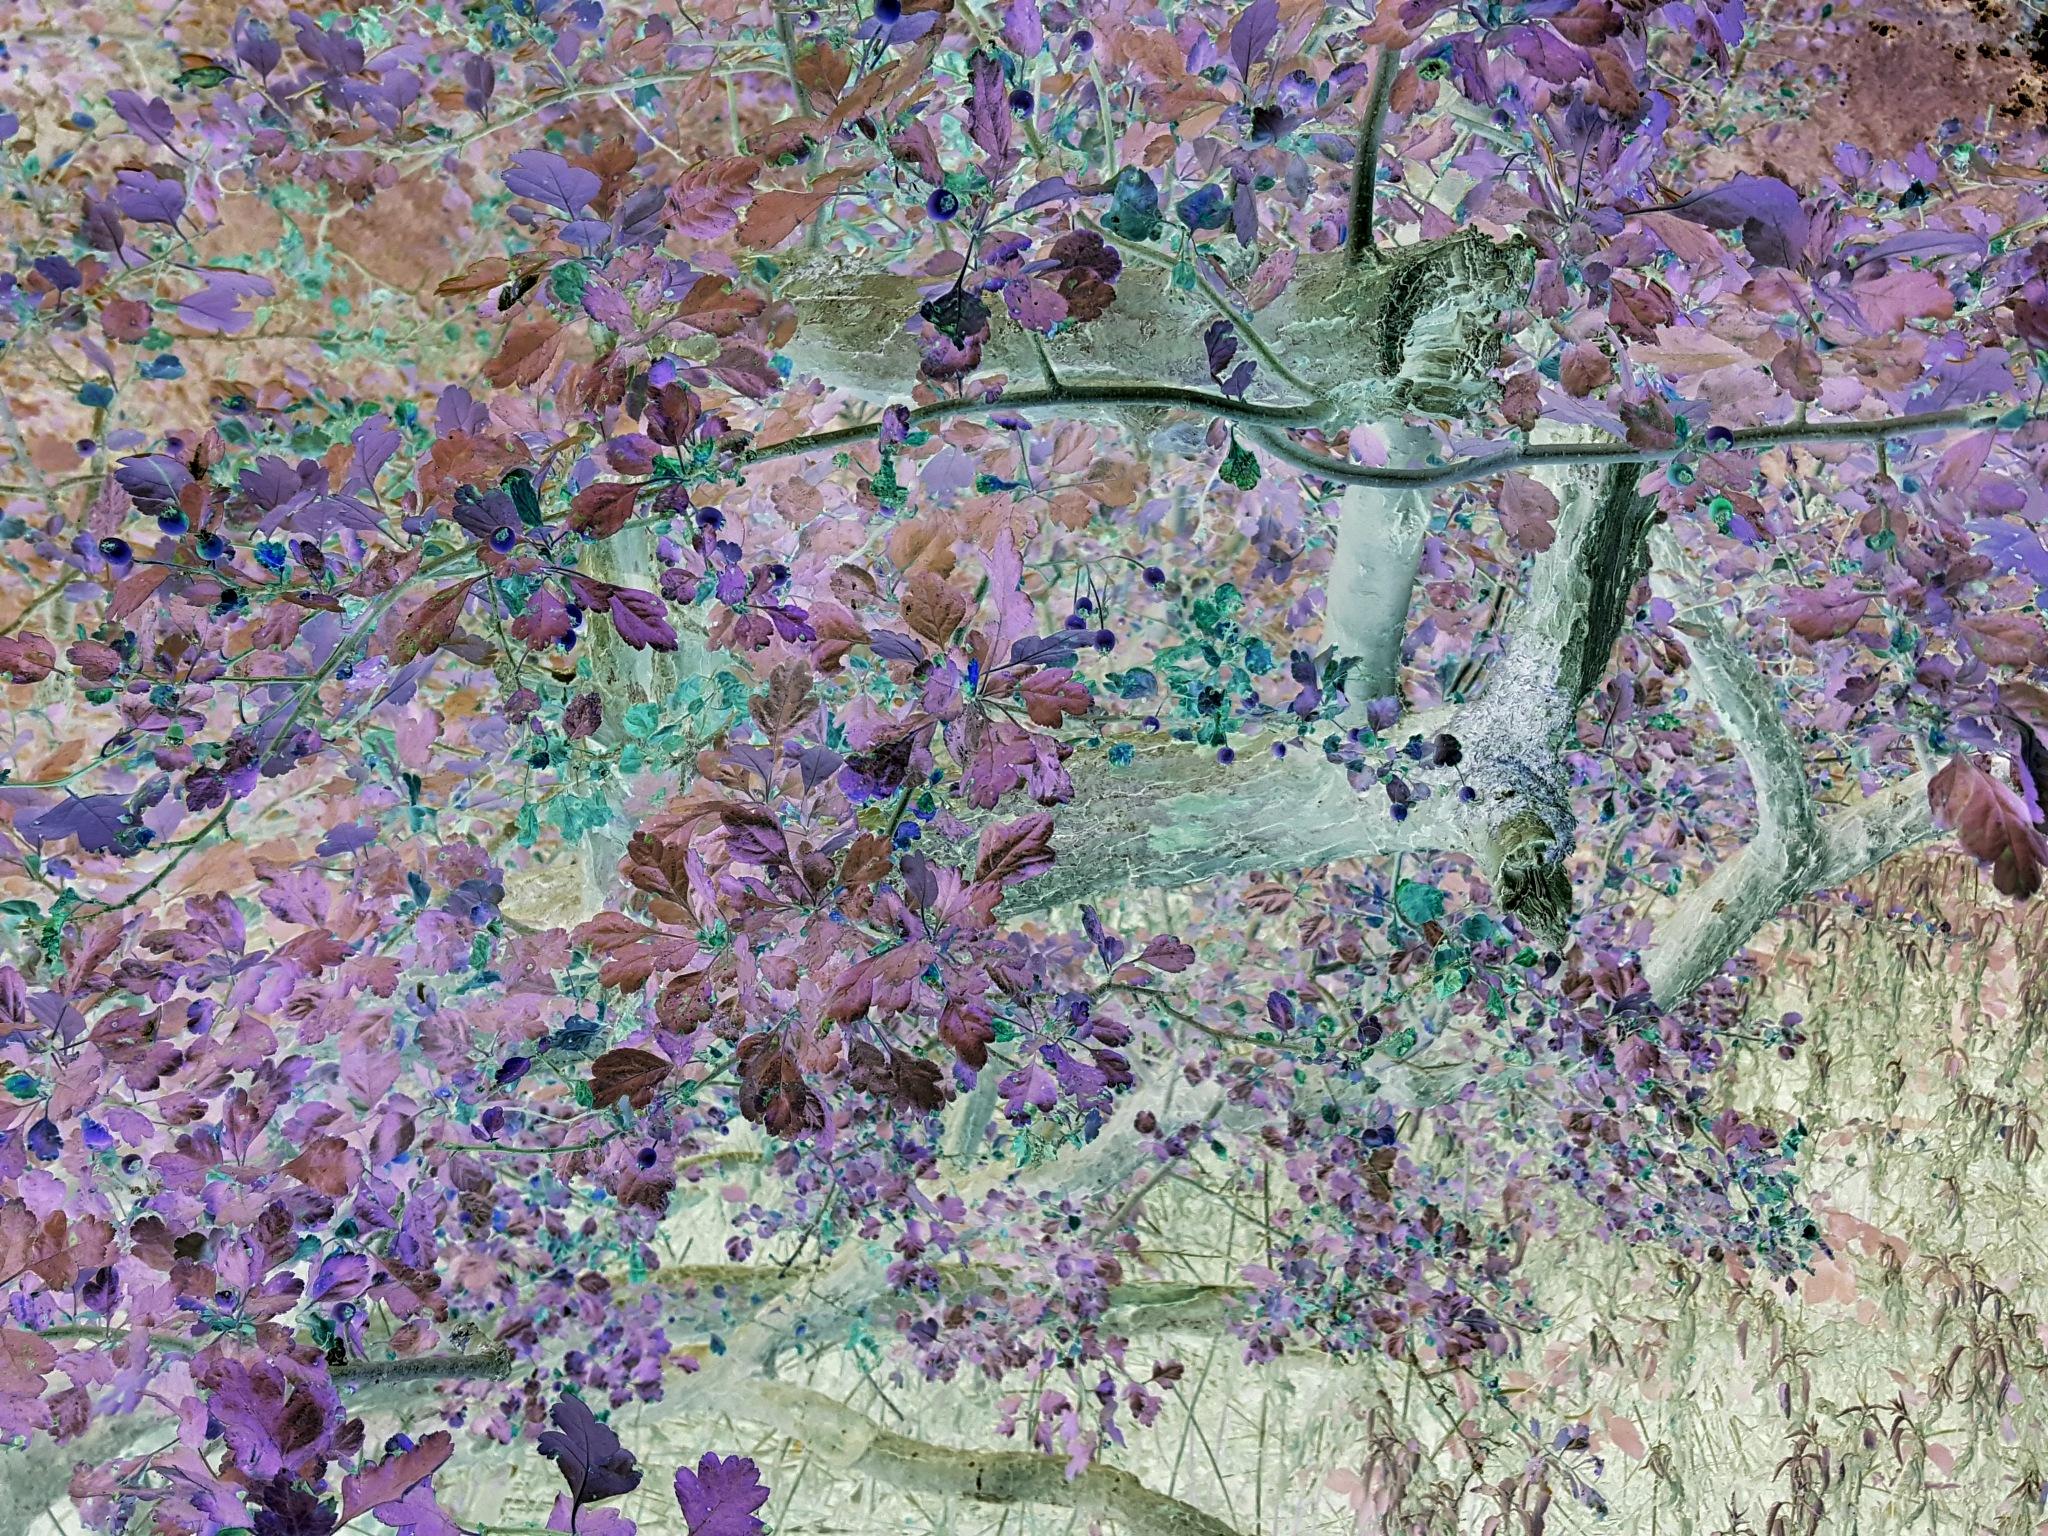 'Colorful Nature' by John Jack Dubajka